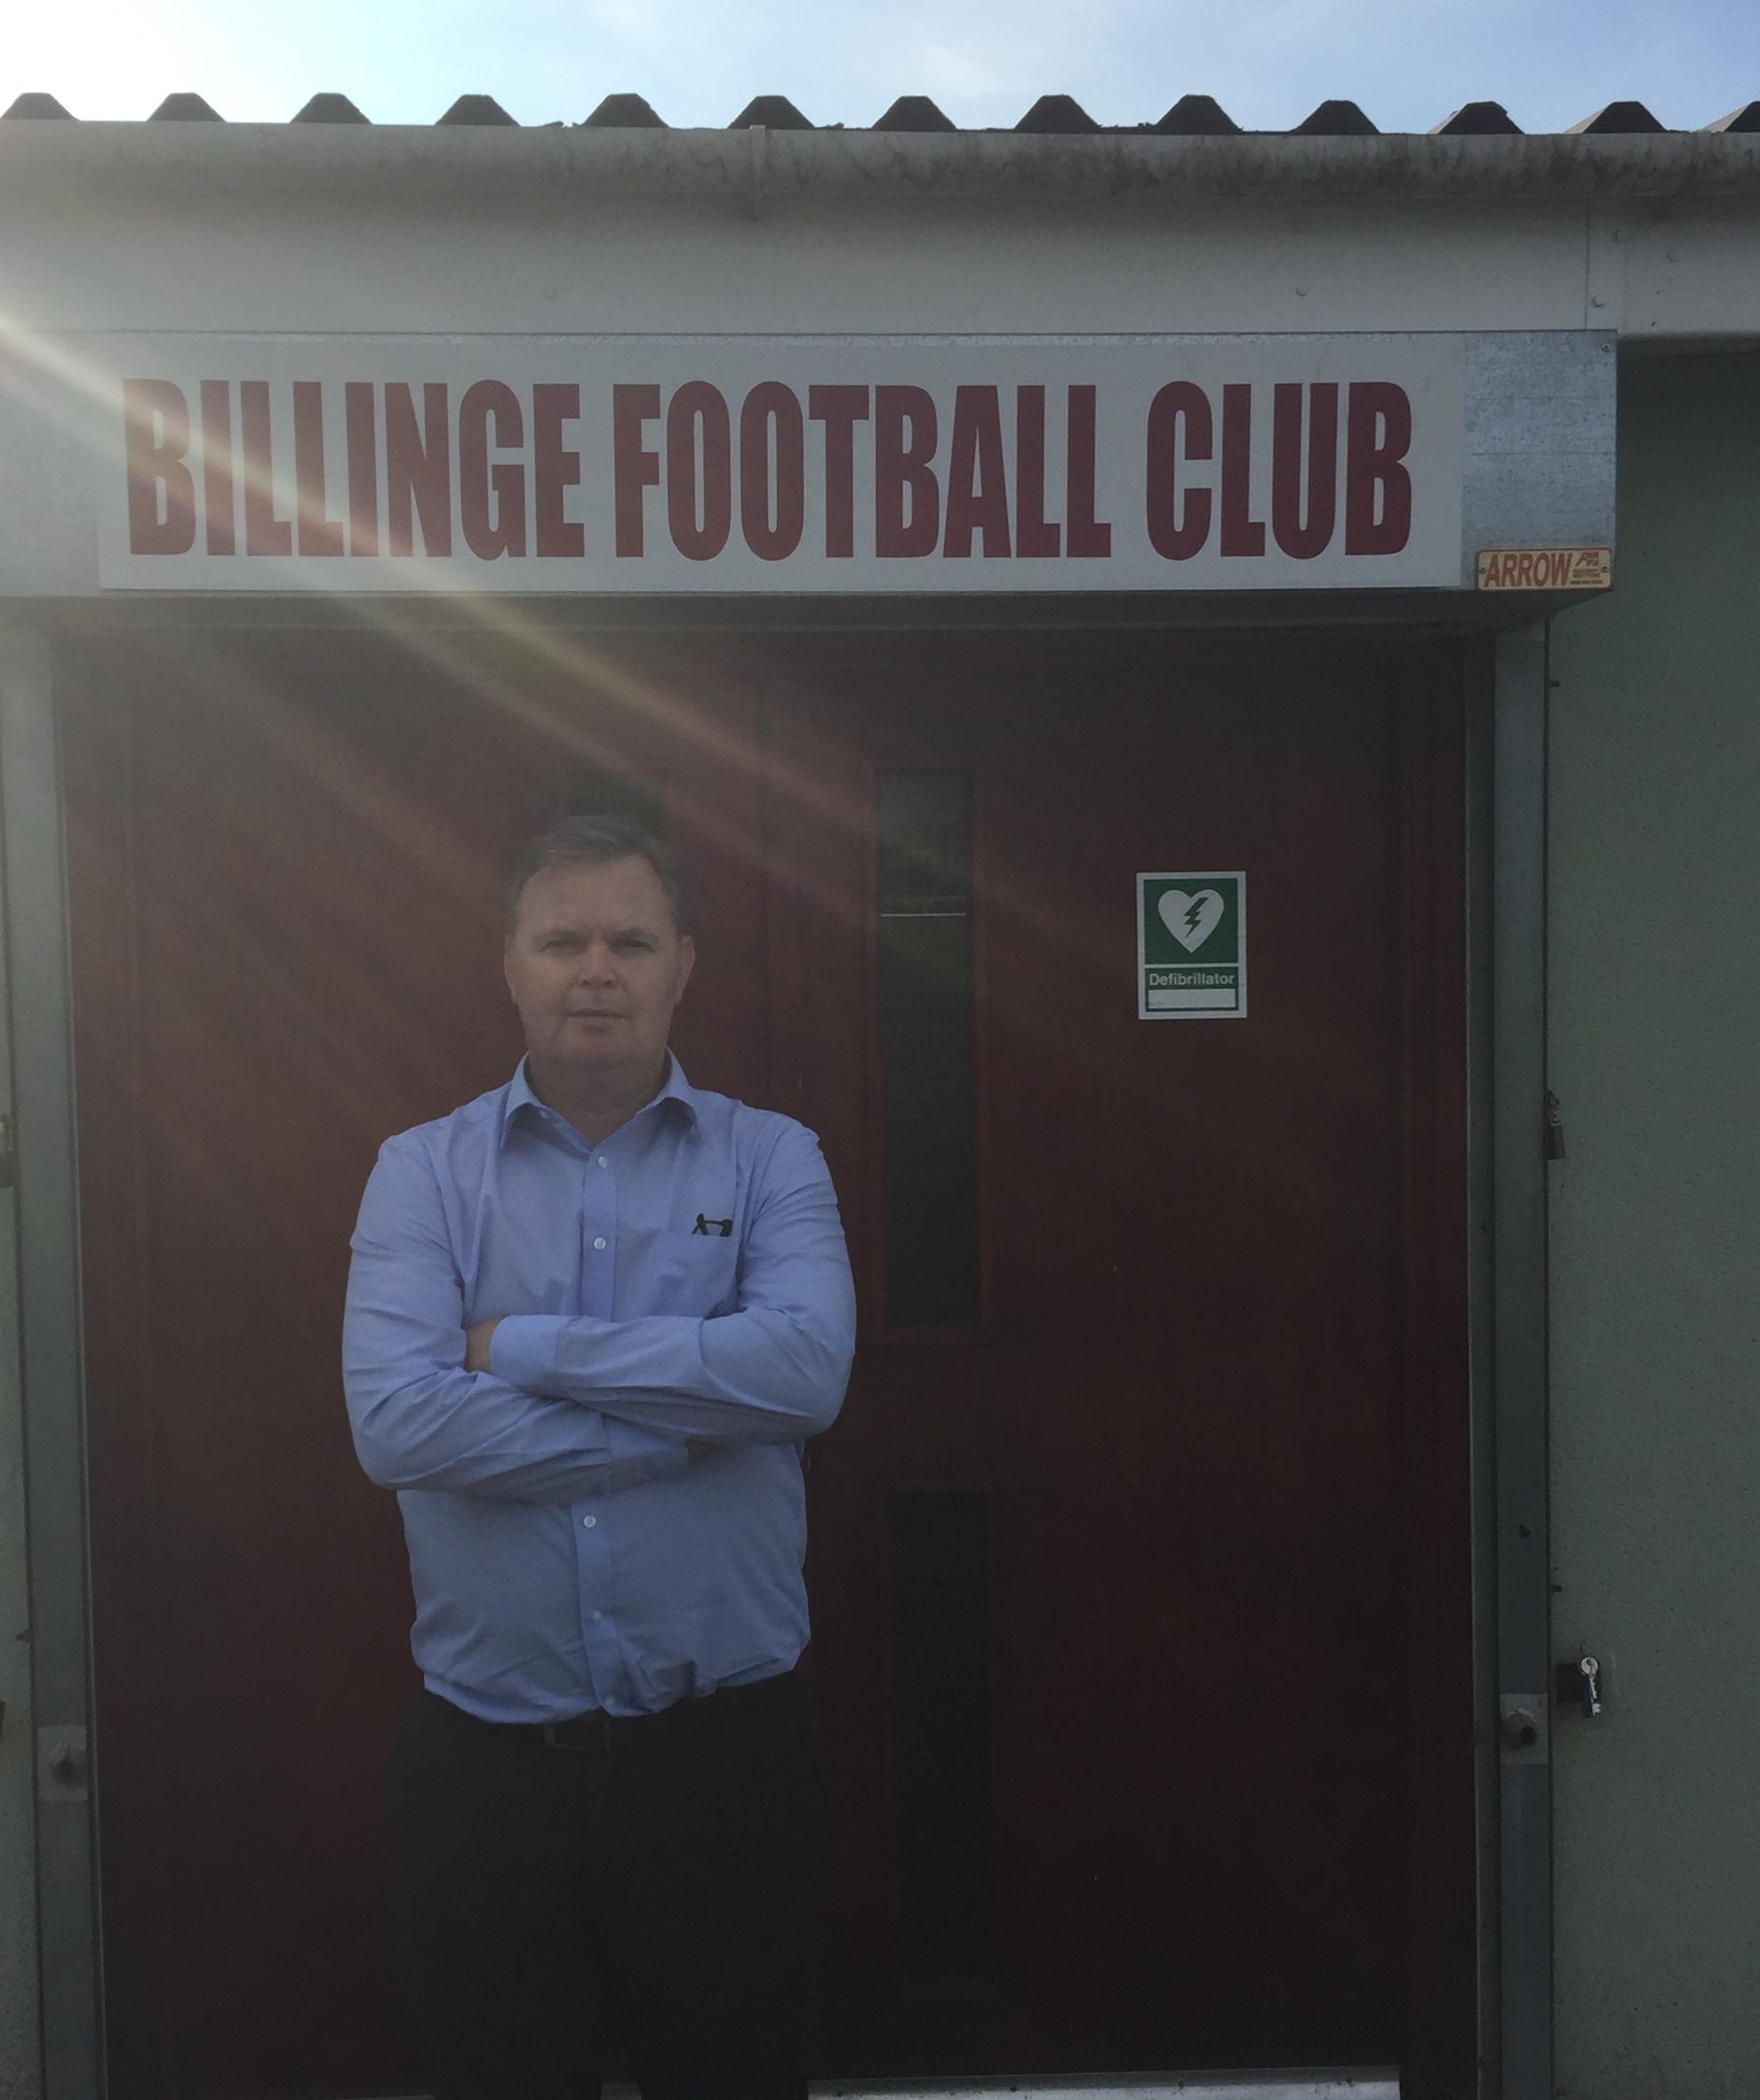 John Evans stood below Billinge Football Club sign